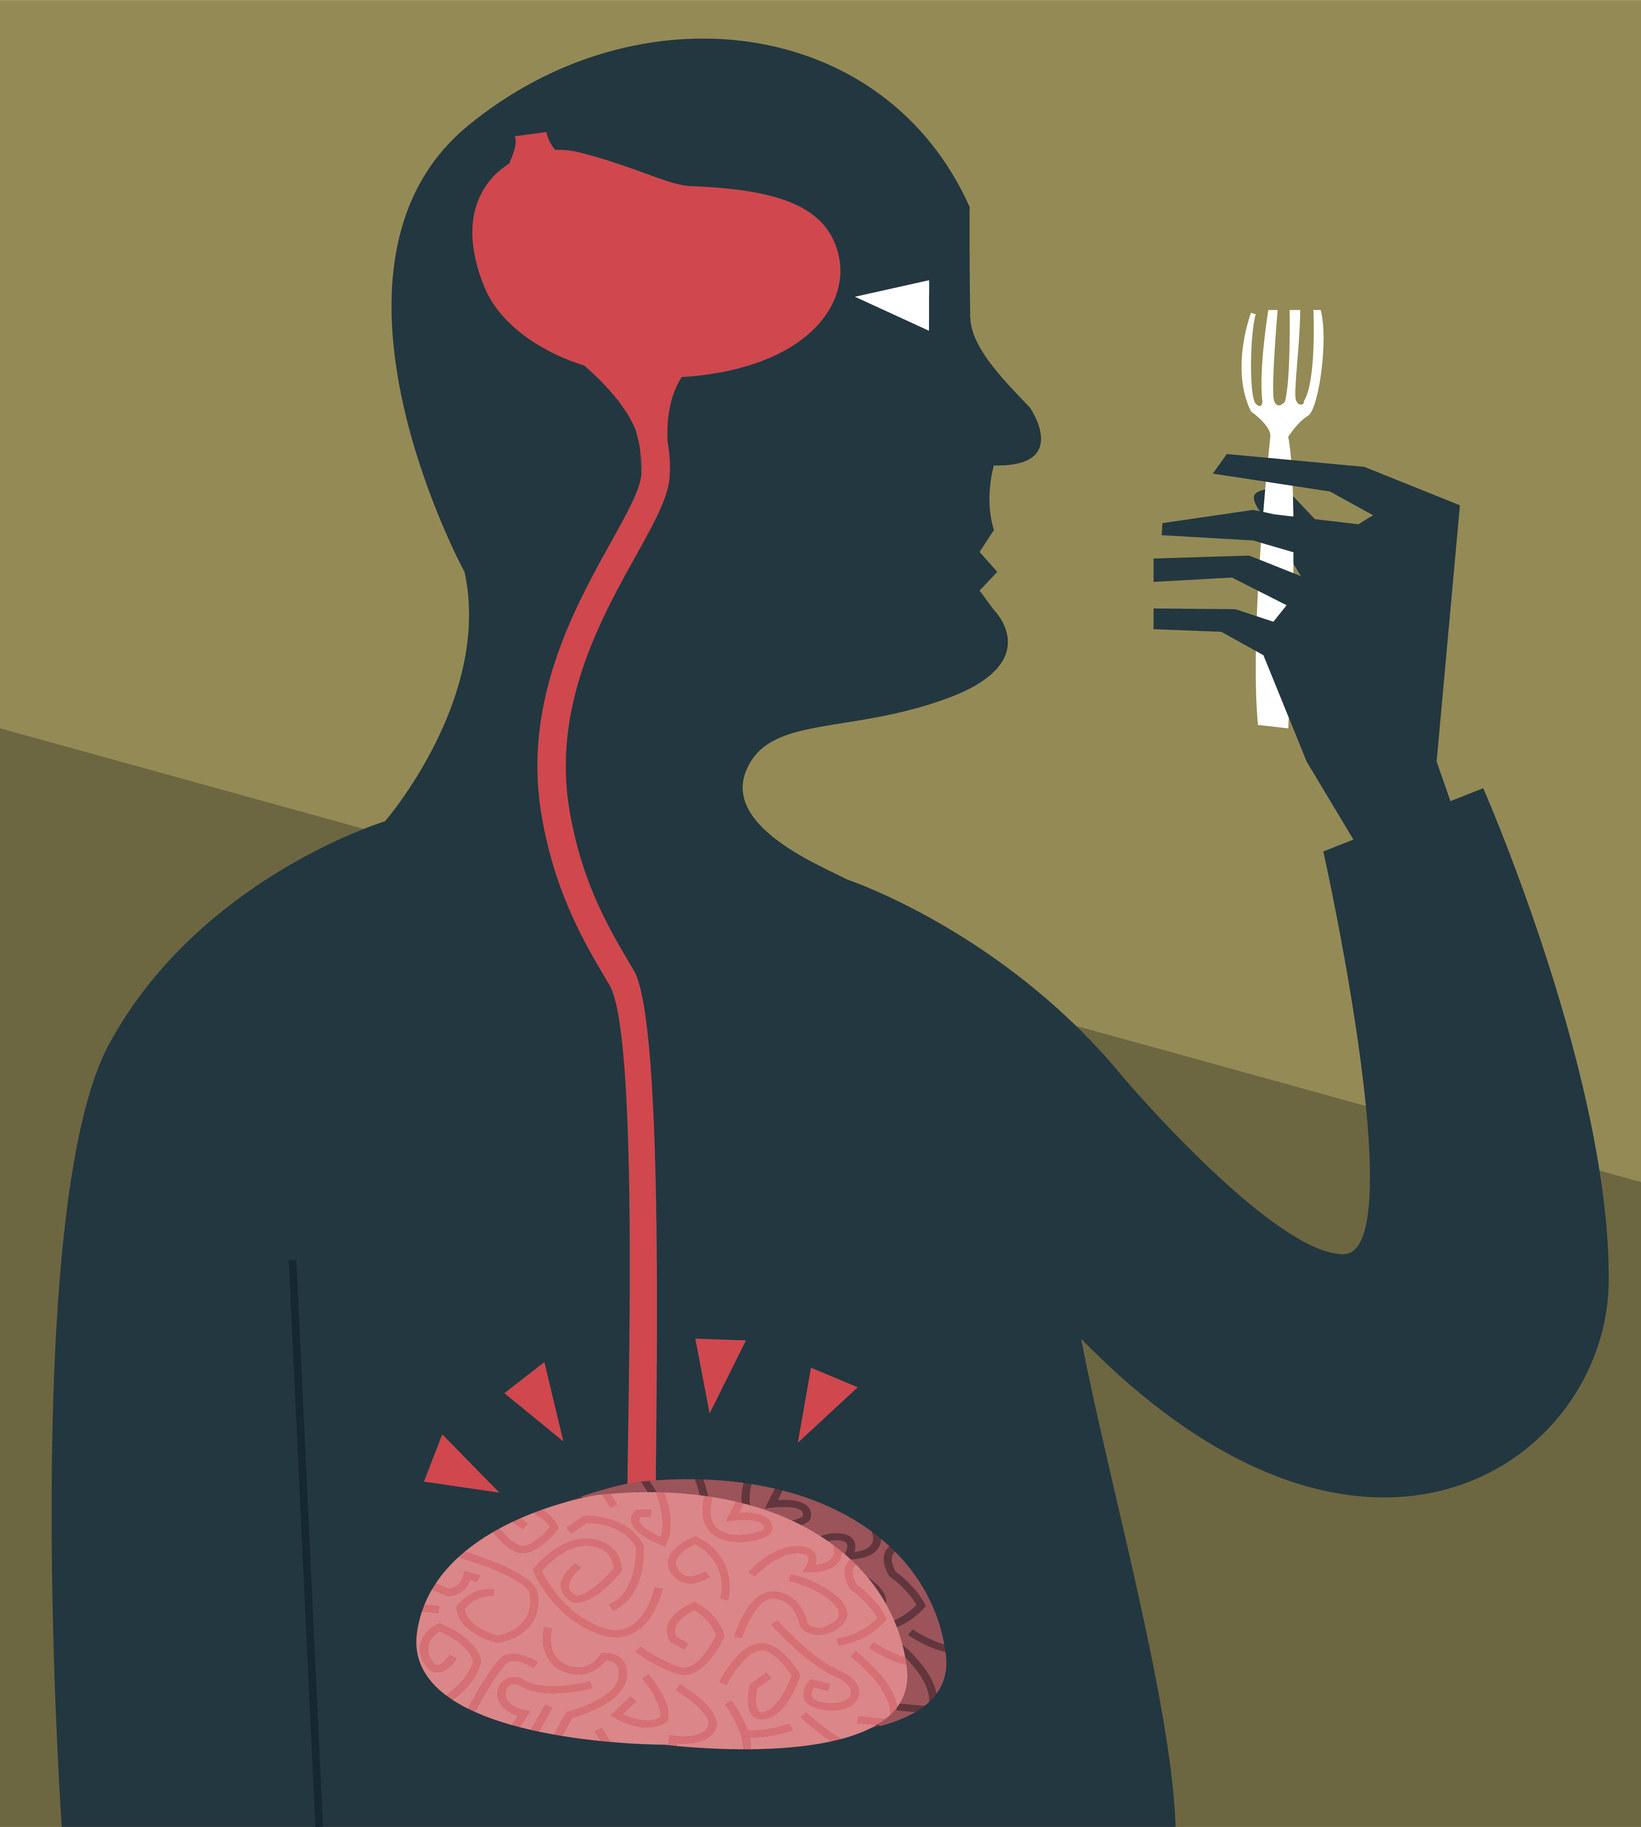 Illustration of a man staring at a fork